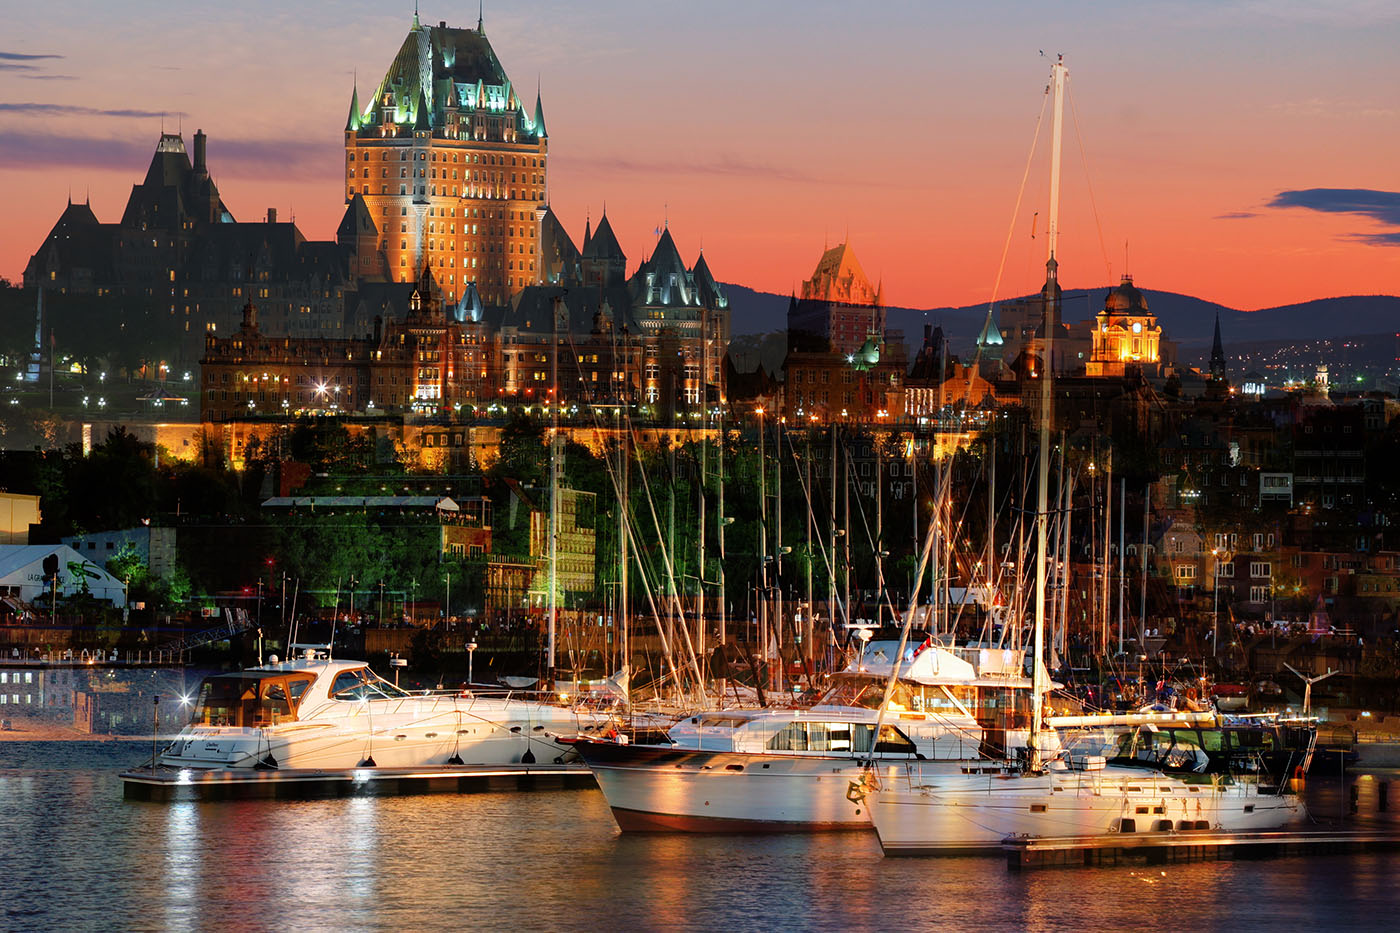 Quebec City Marina - Stock Photography